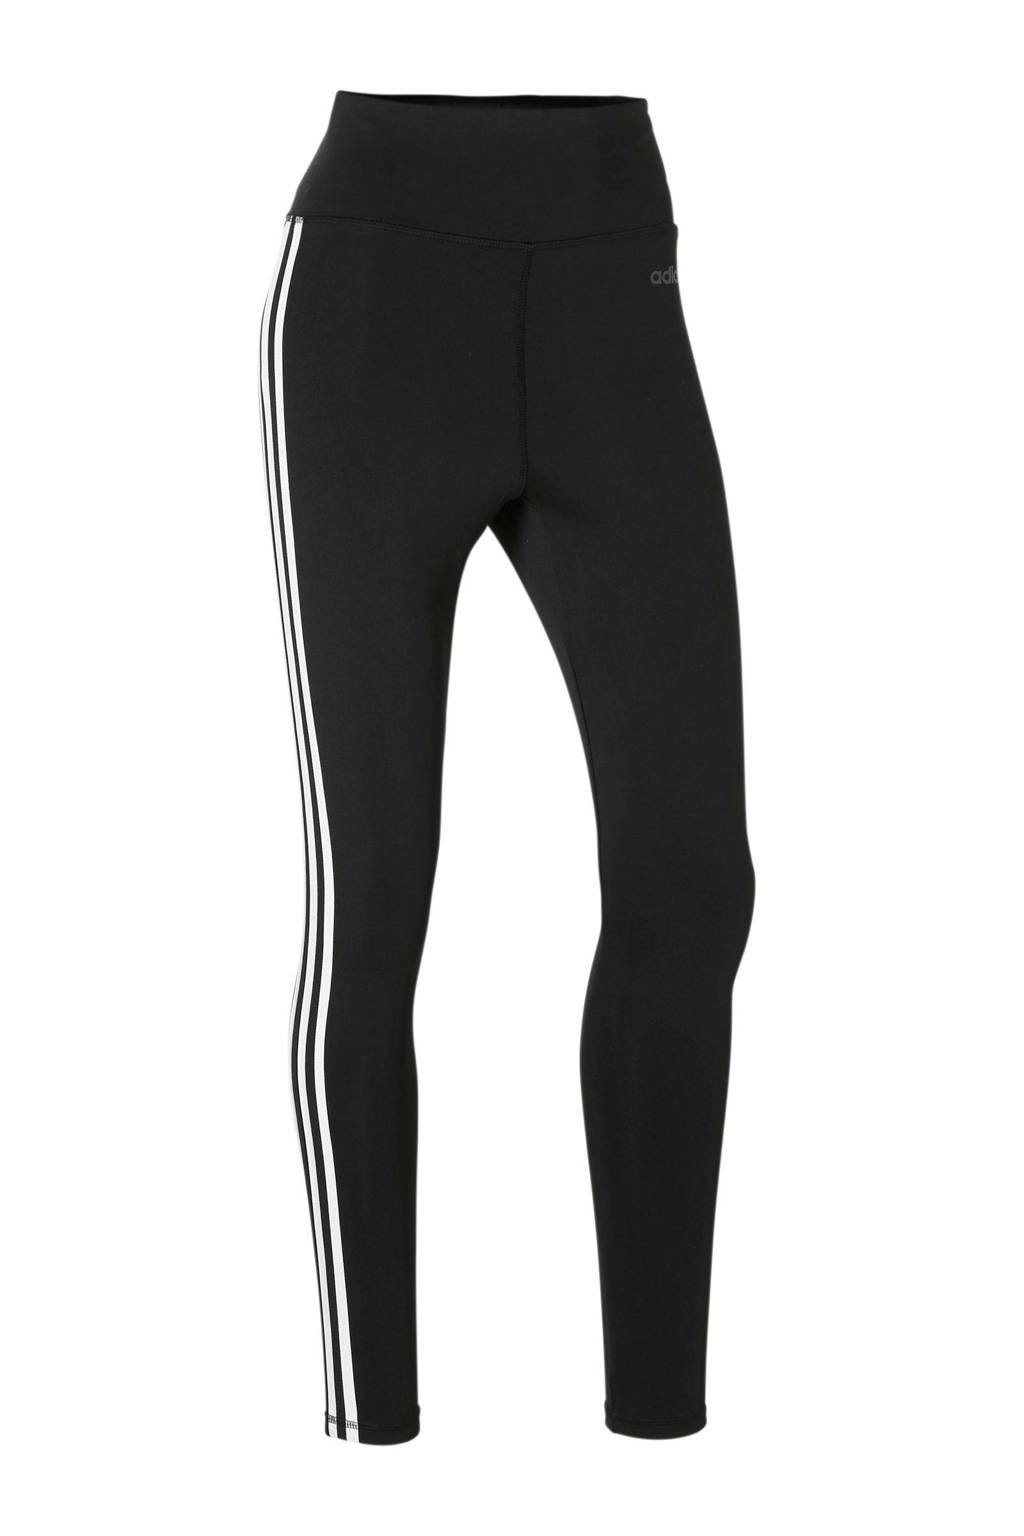 adidas Performance sportbroek zwart, Zwaer